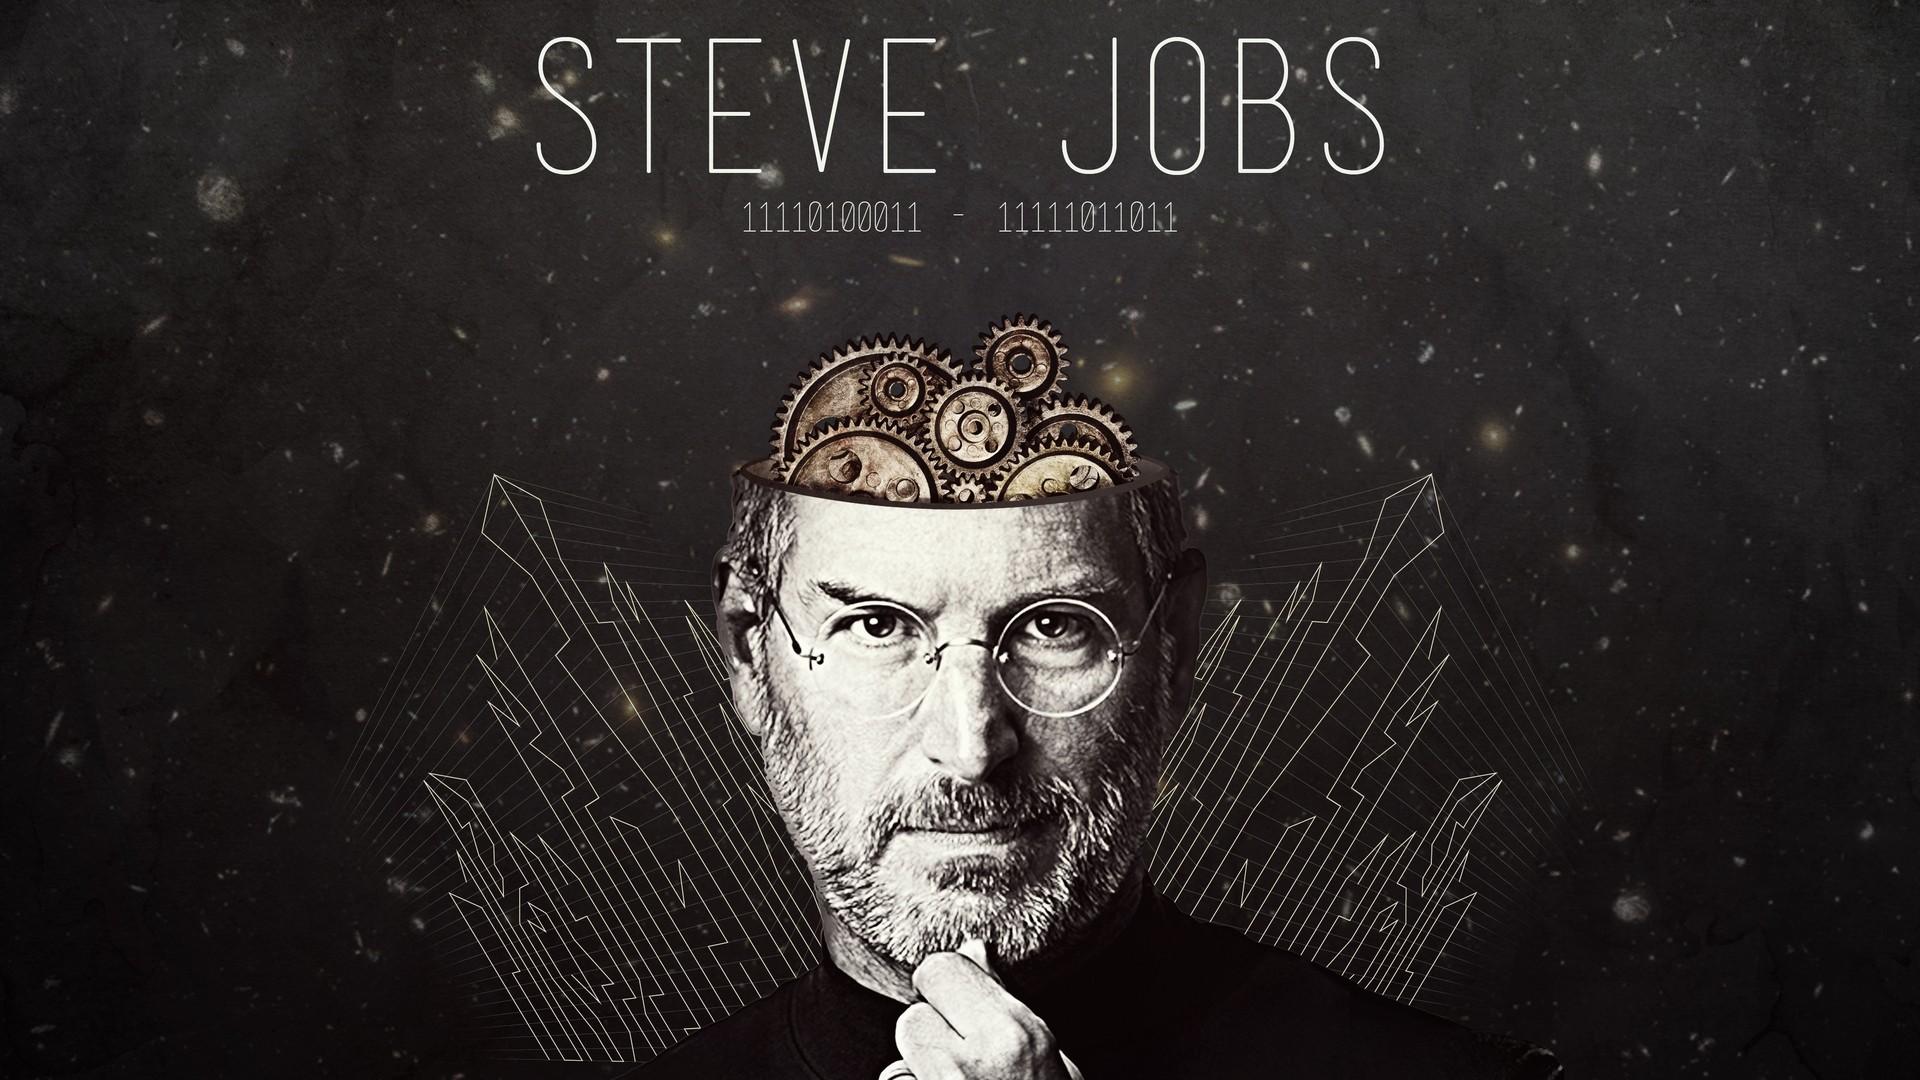 Steve Jobs desktop wallpaper